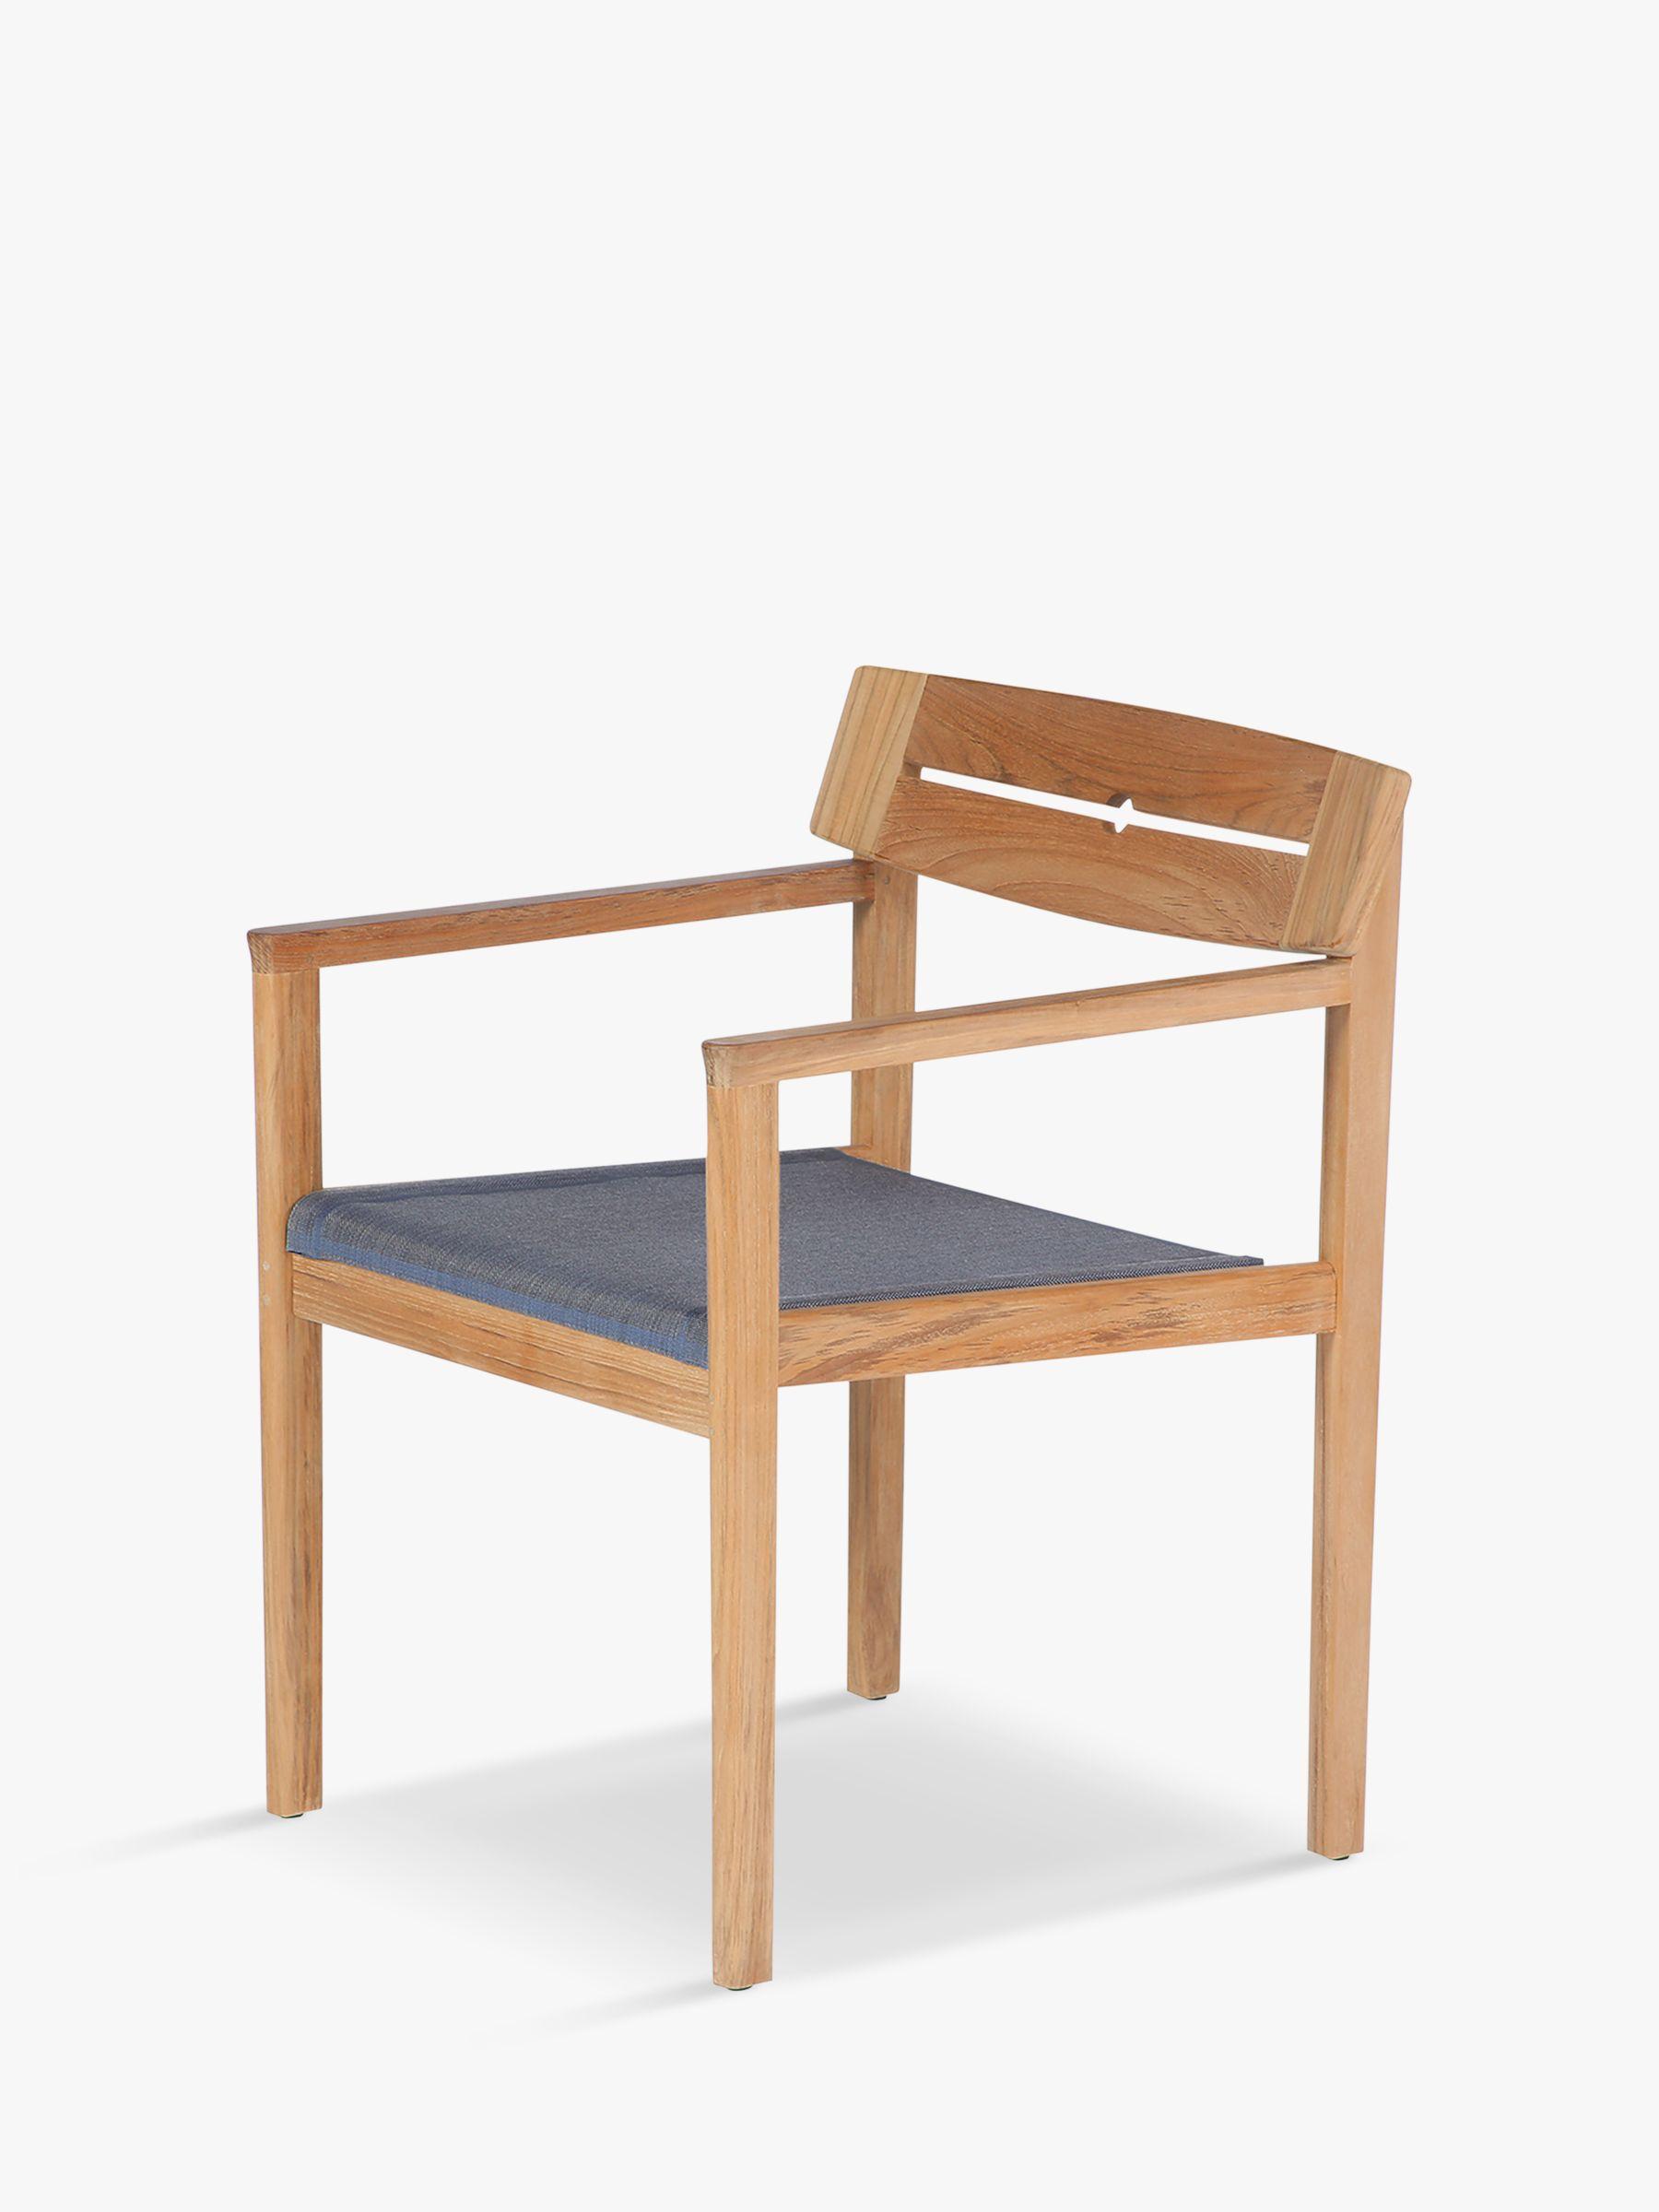 Barlow Tyrie Barlow Tyrie Atom Teak Wood Garden Dining Chair, Natural